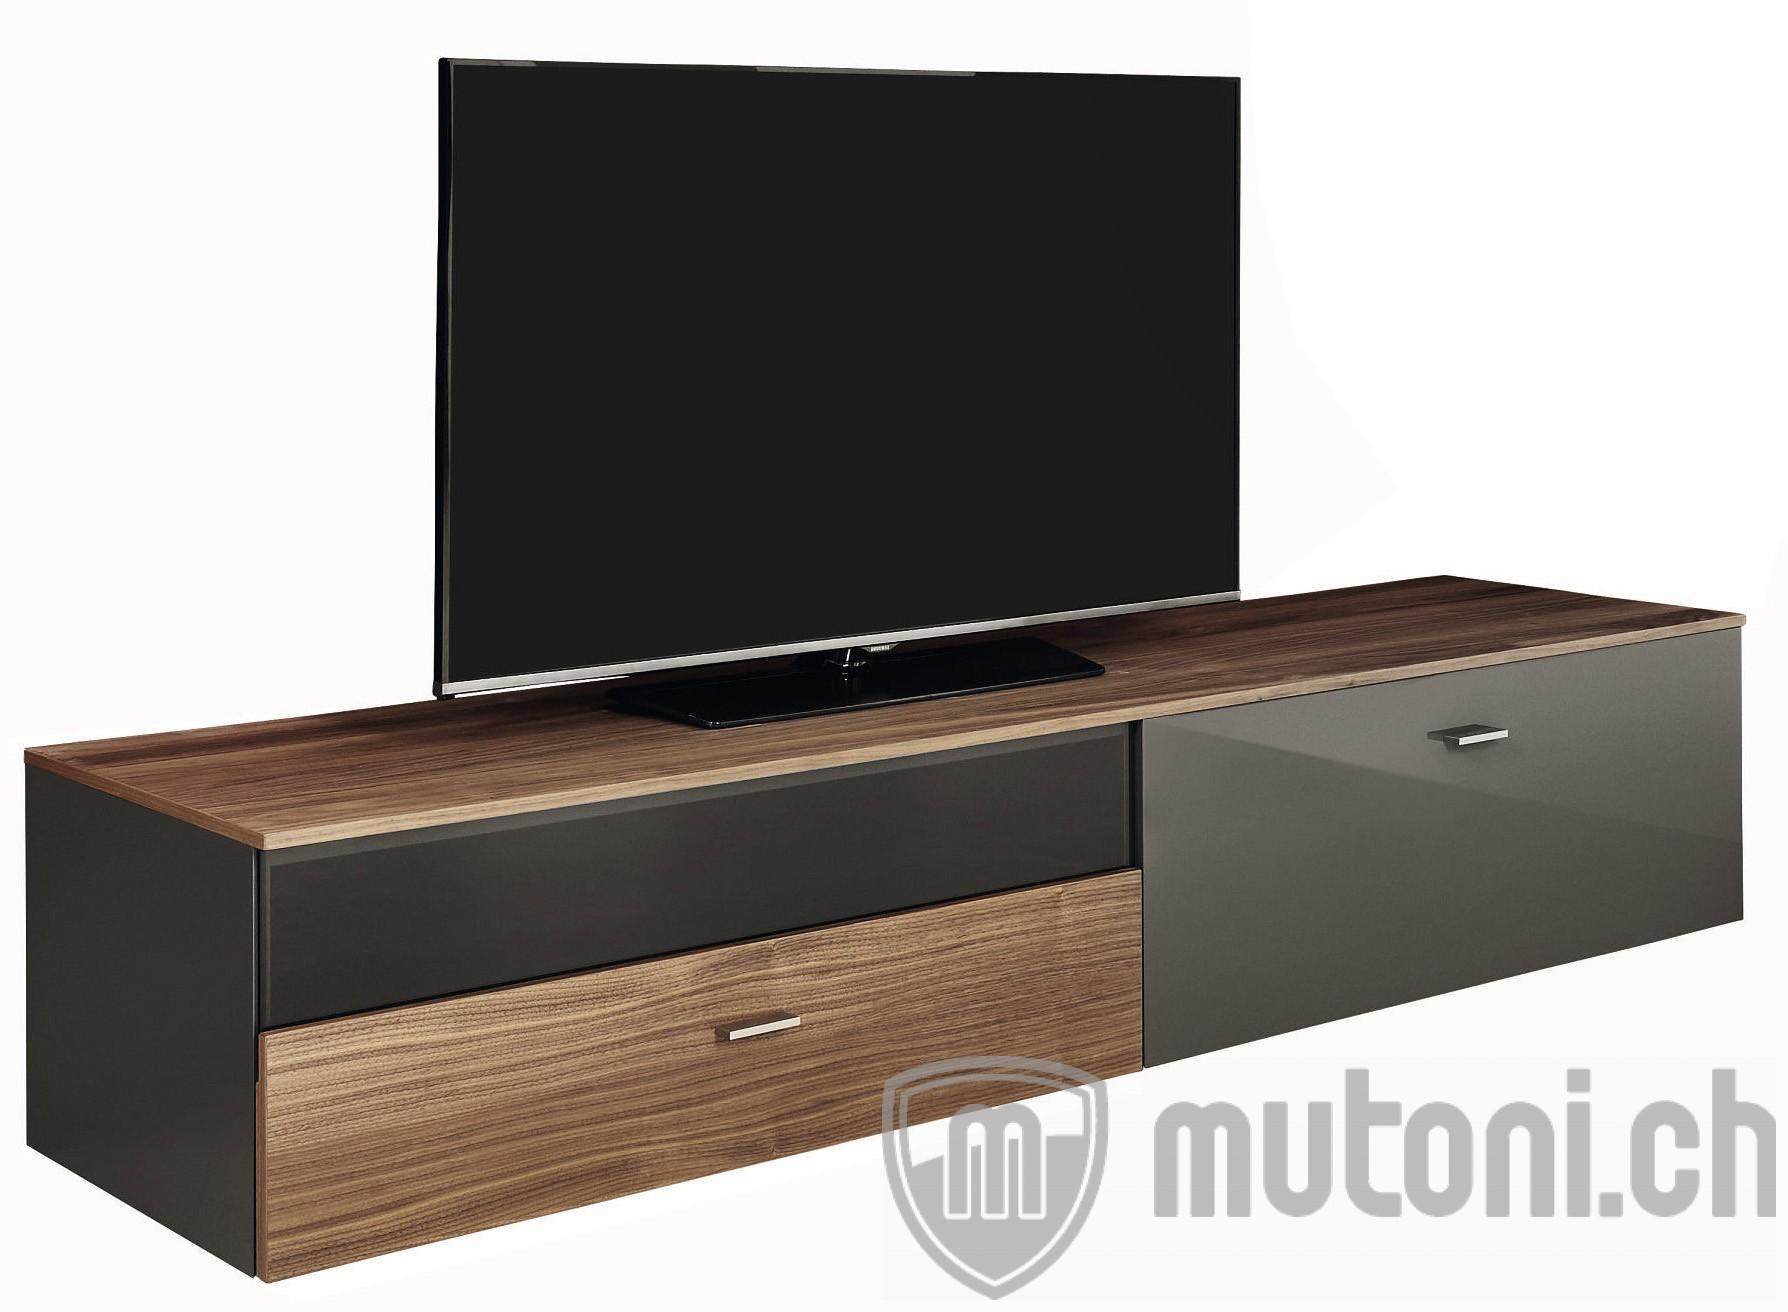 lowboard now links mit 1 schublade und 1 klappe 210x38cm h lsta mutoni m bel. Black Bedroom Furniture Sets. Home Design Ideas